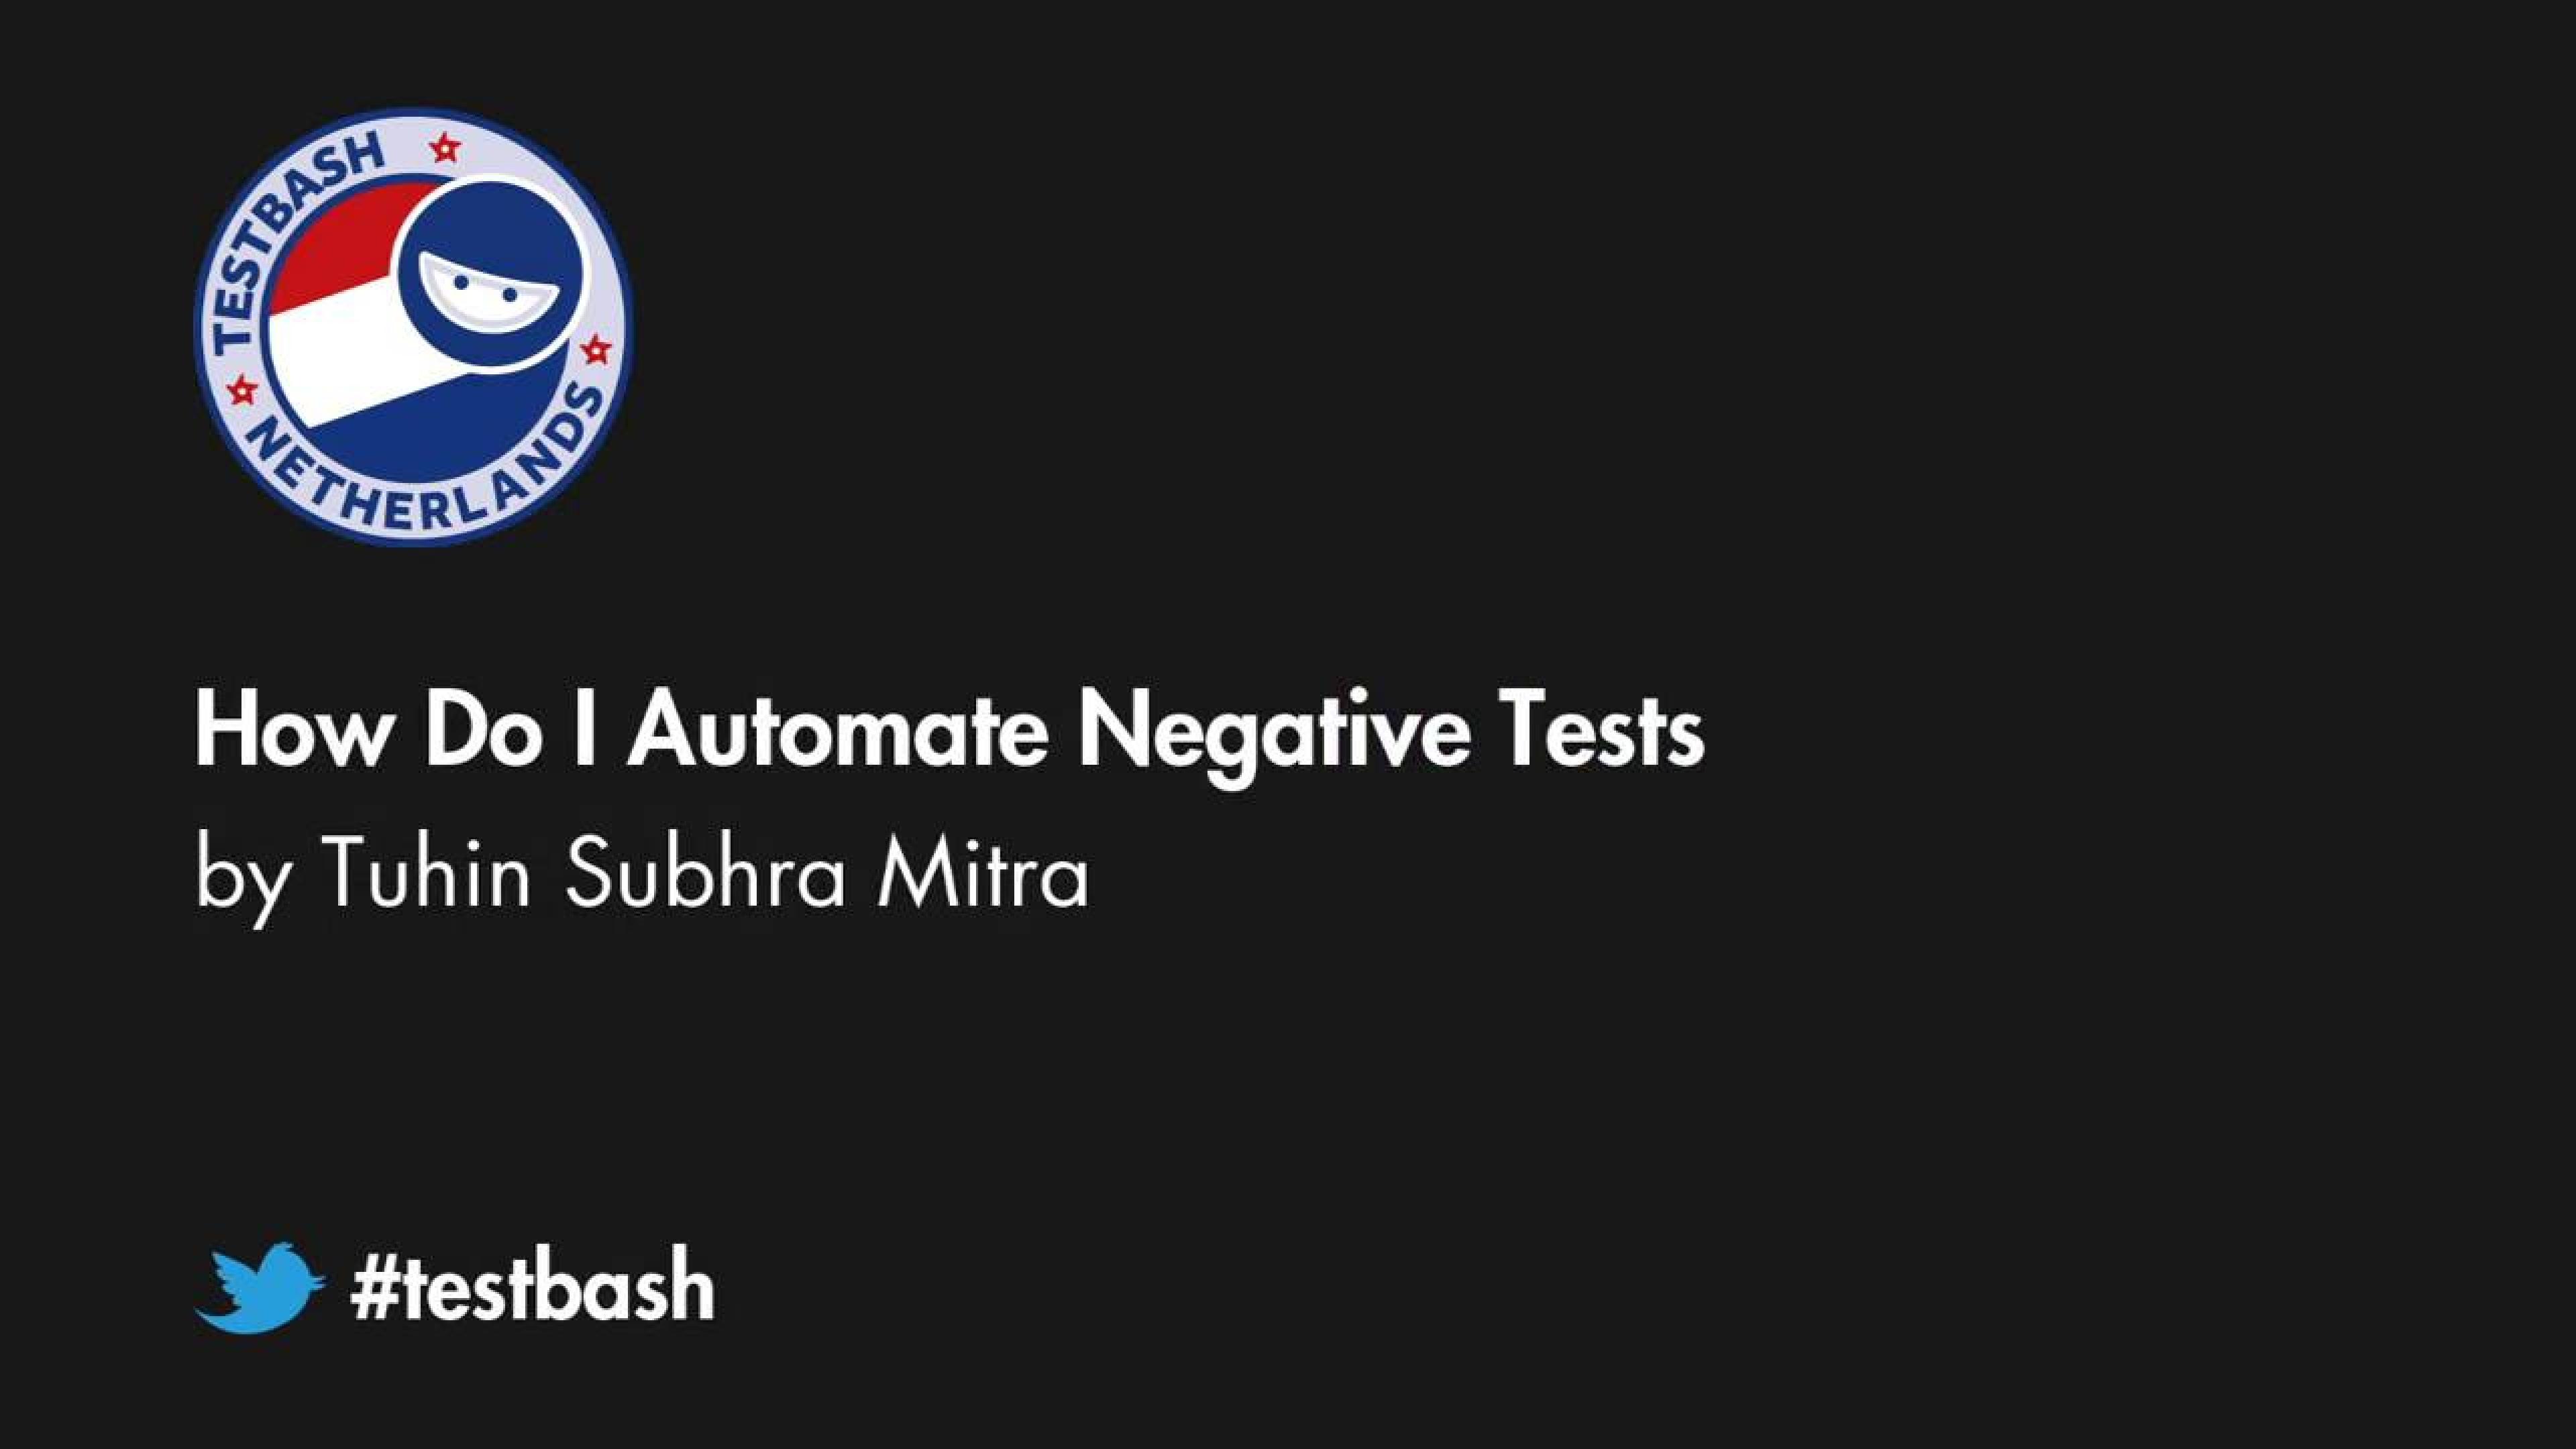 How Do I Automate Negative Tests - Tuhin Subhra Mitra